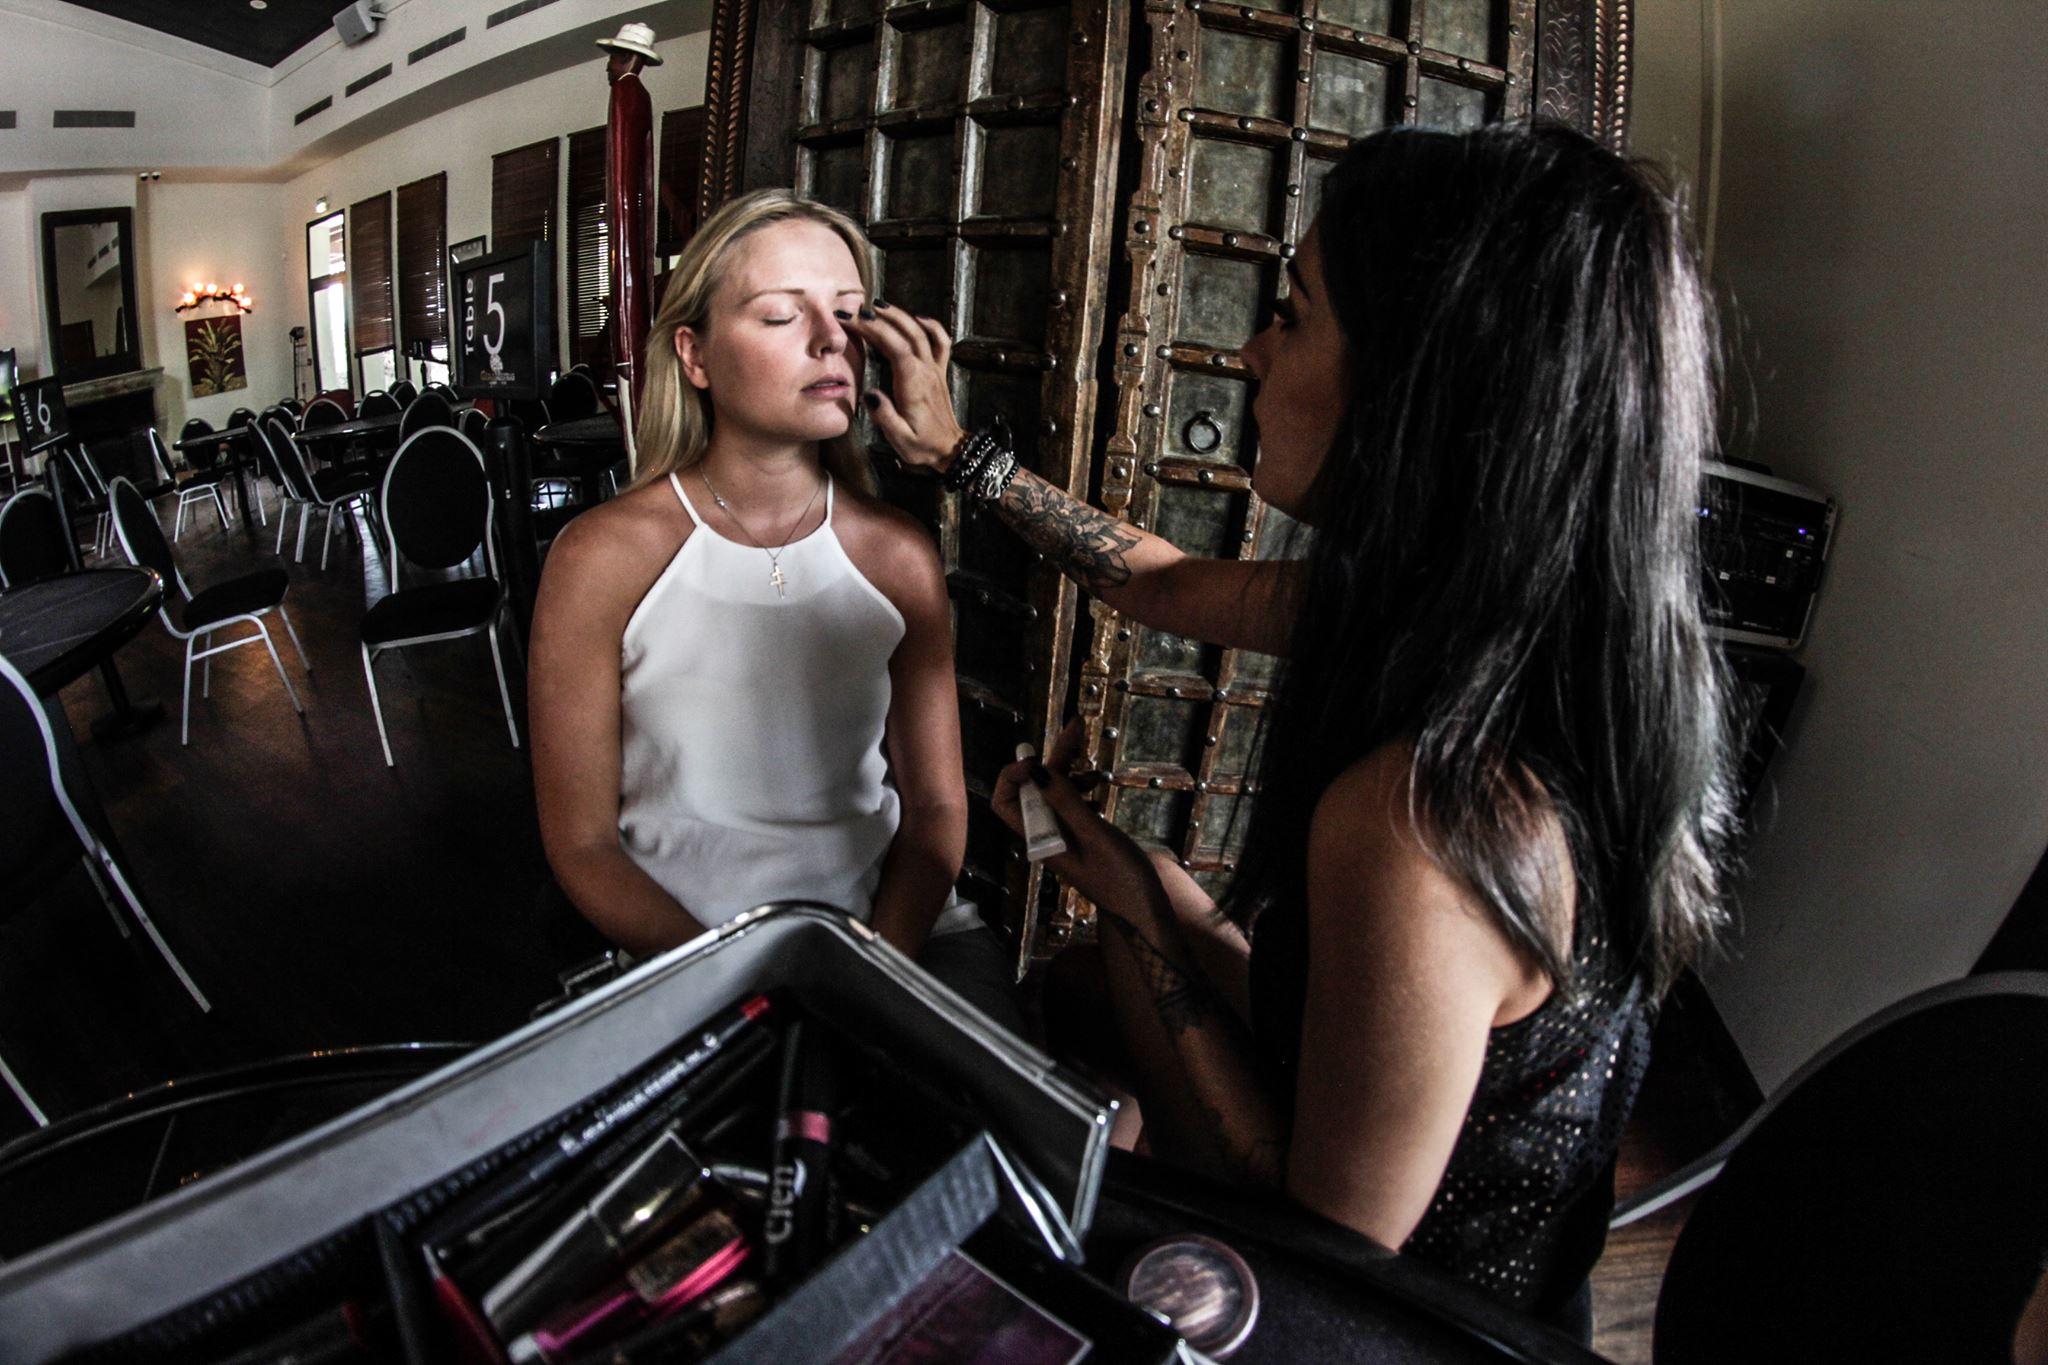 La joueuse Patty Beaumier en plein maquillage